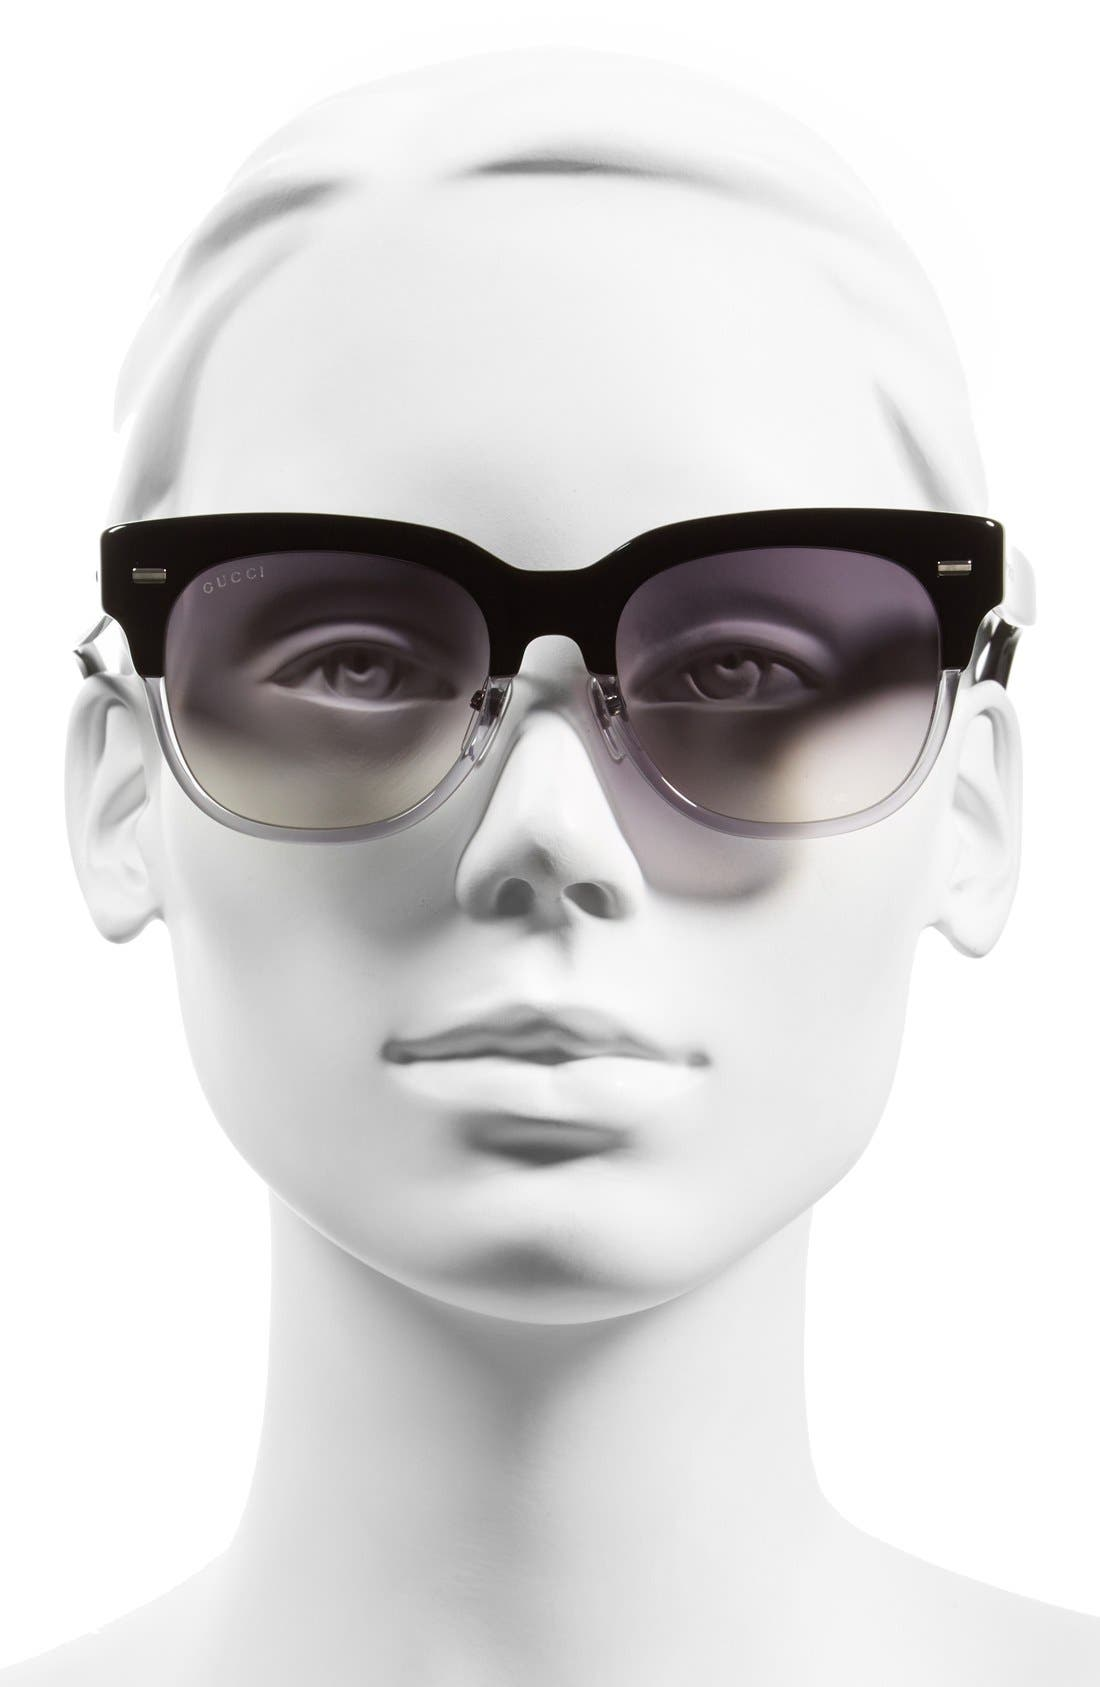 52mm Retro Sunglasses,                             Alternate thumbnail 2, color,                             001